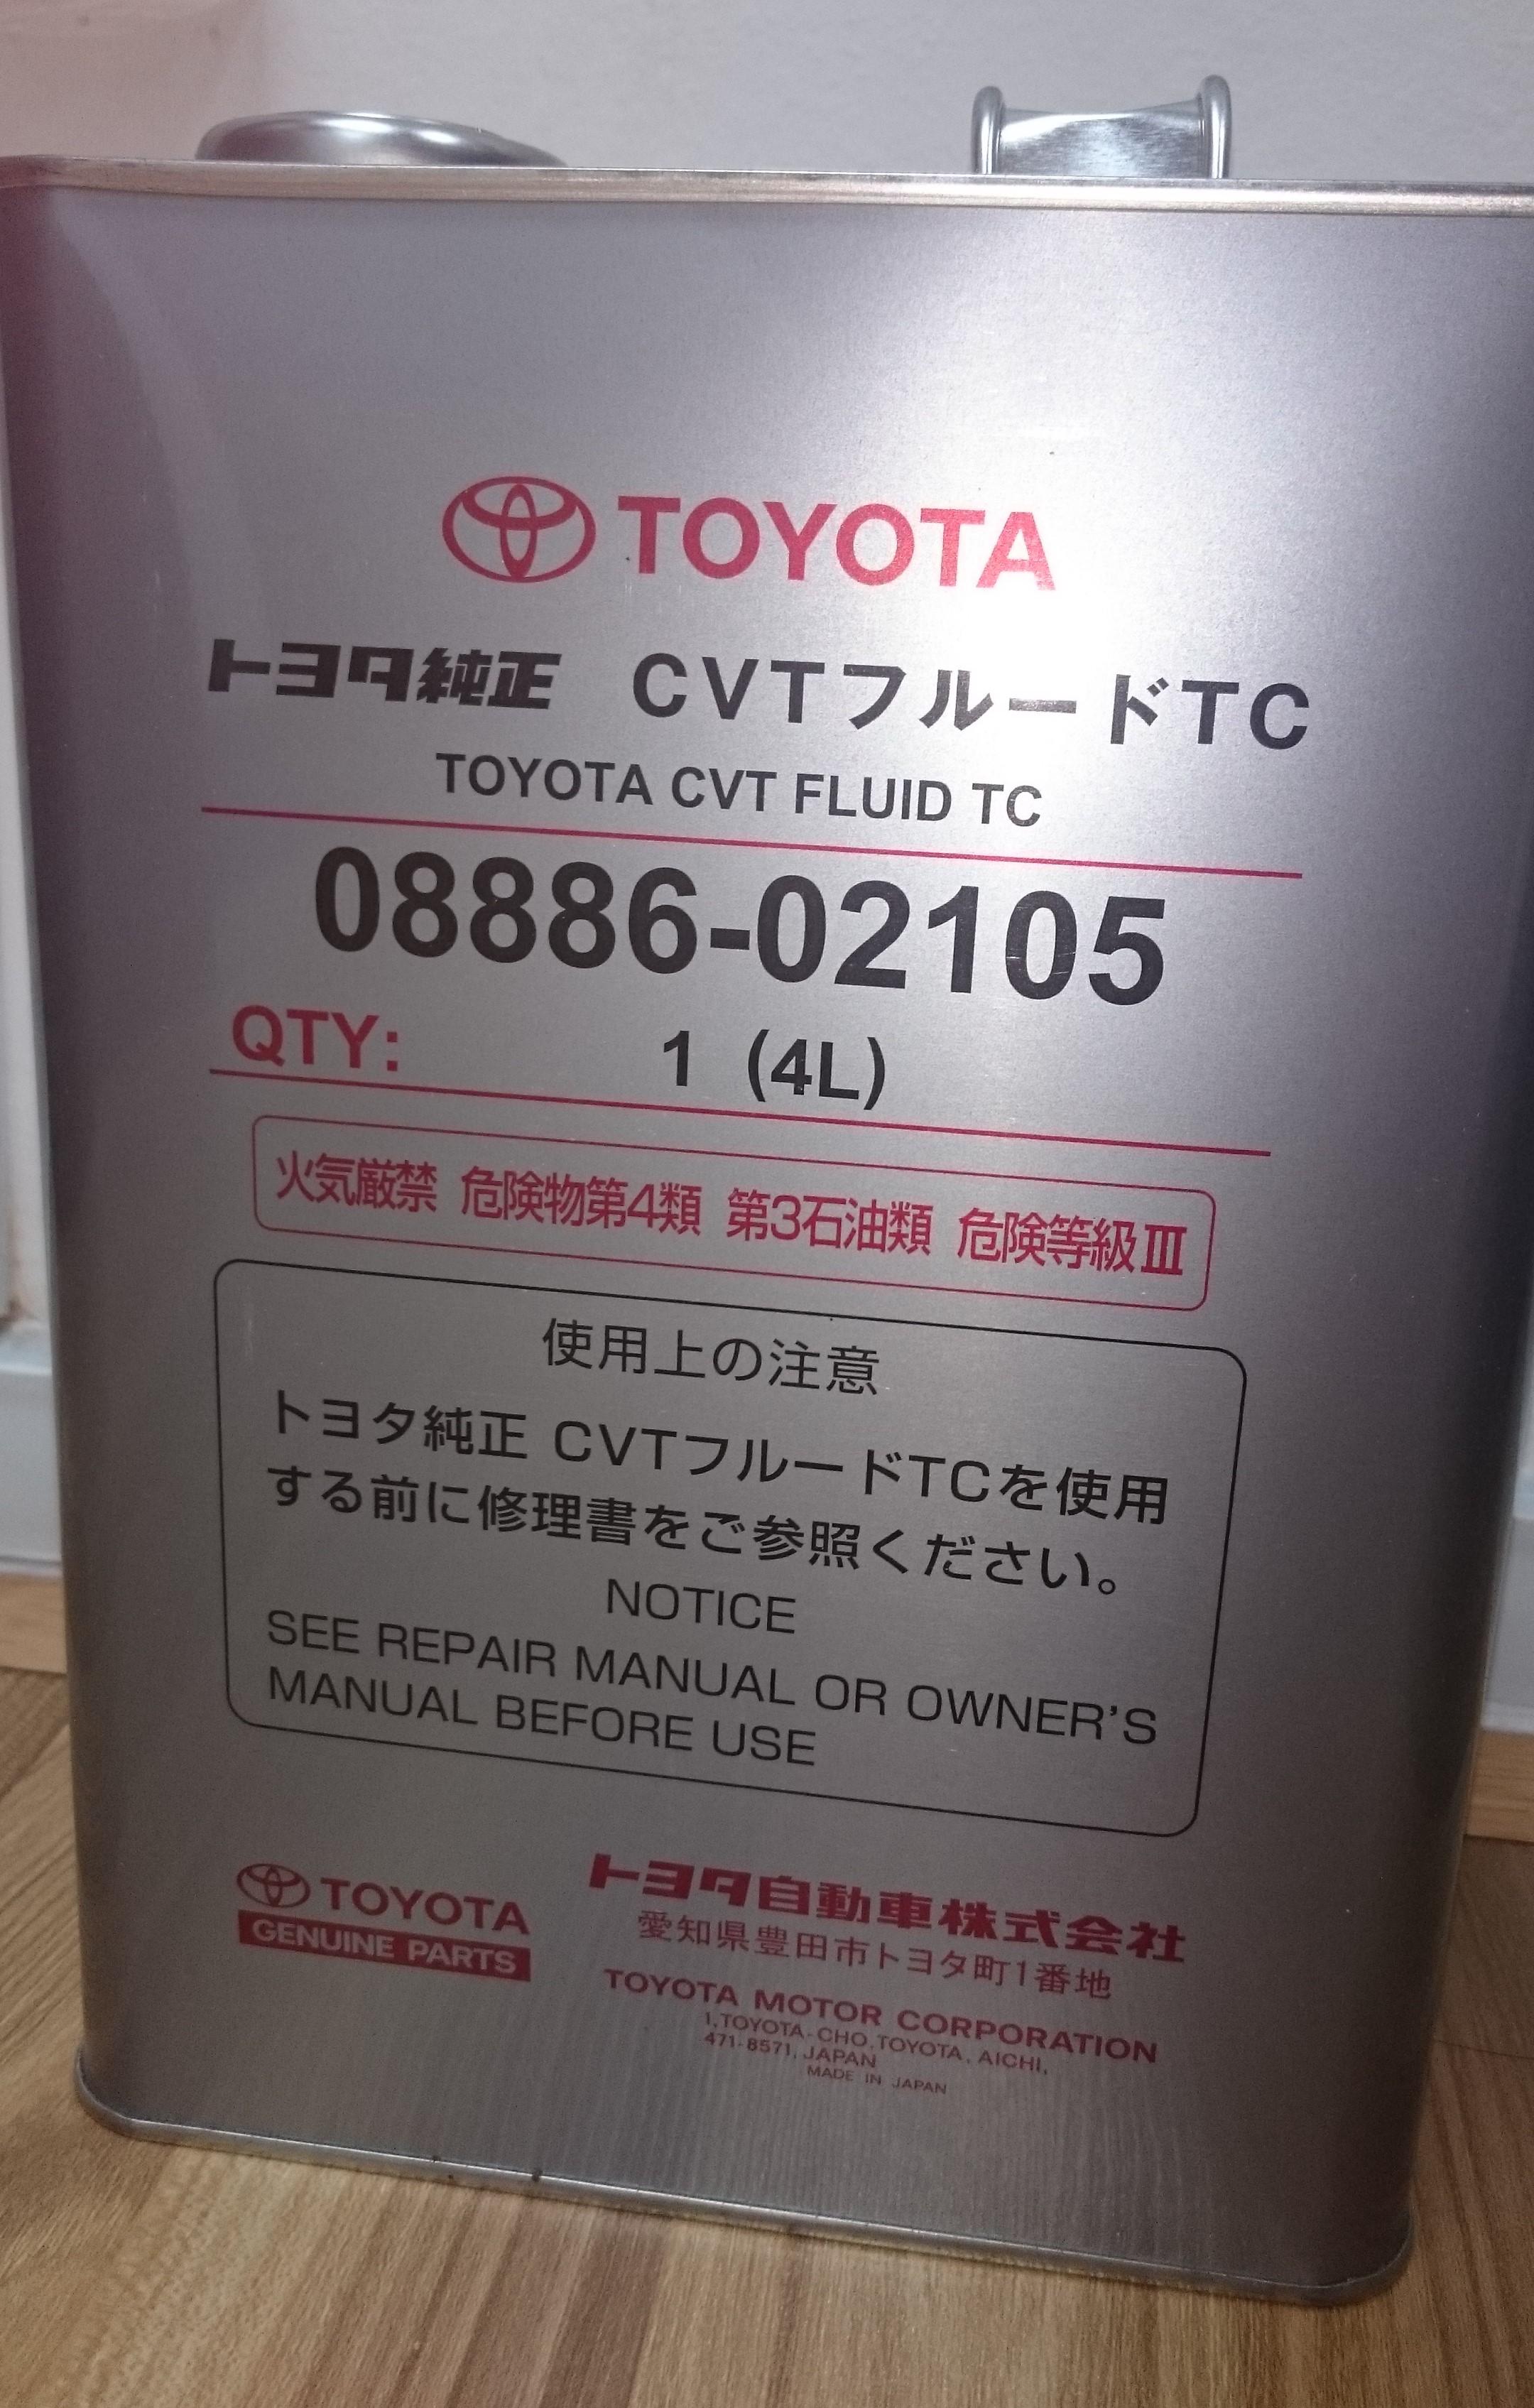 Toyota RAV4 Service Manual: Automatic transaxle fluid